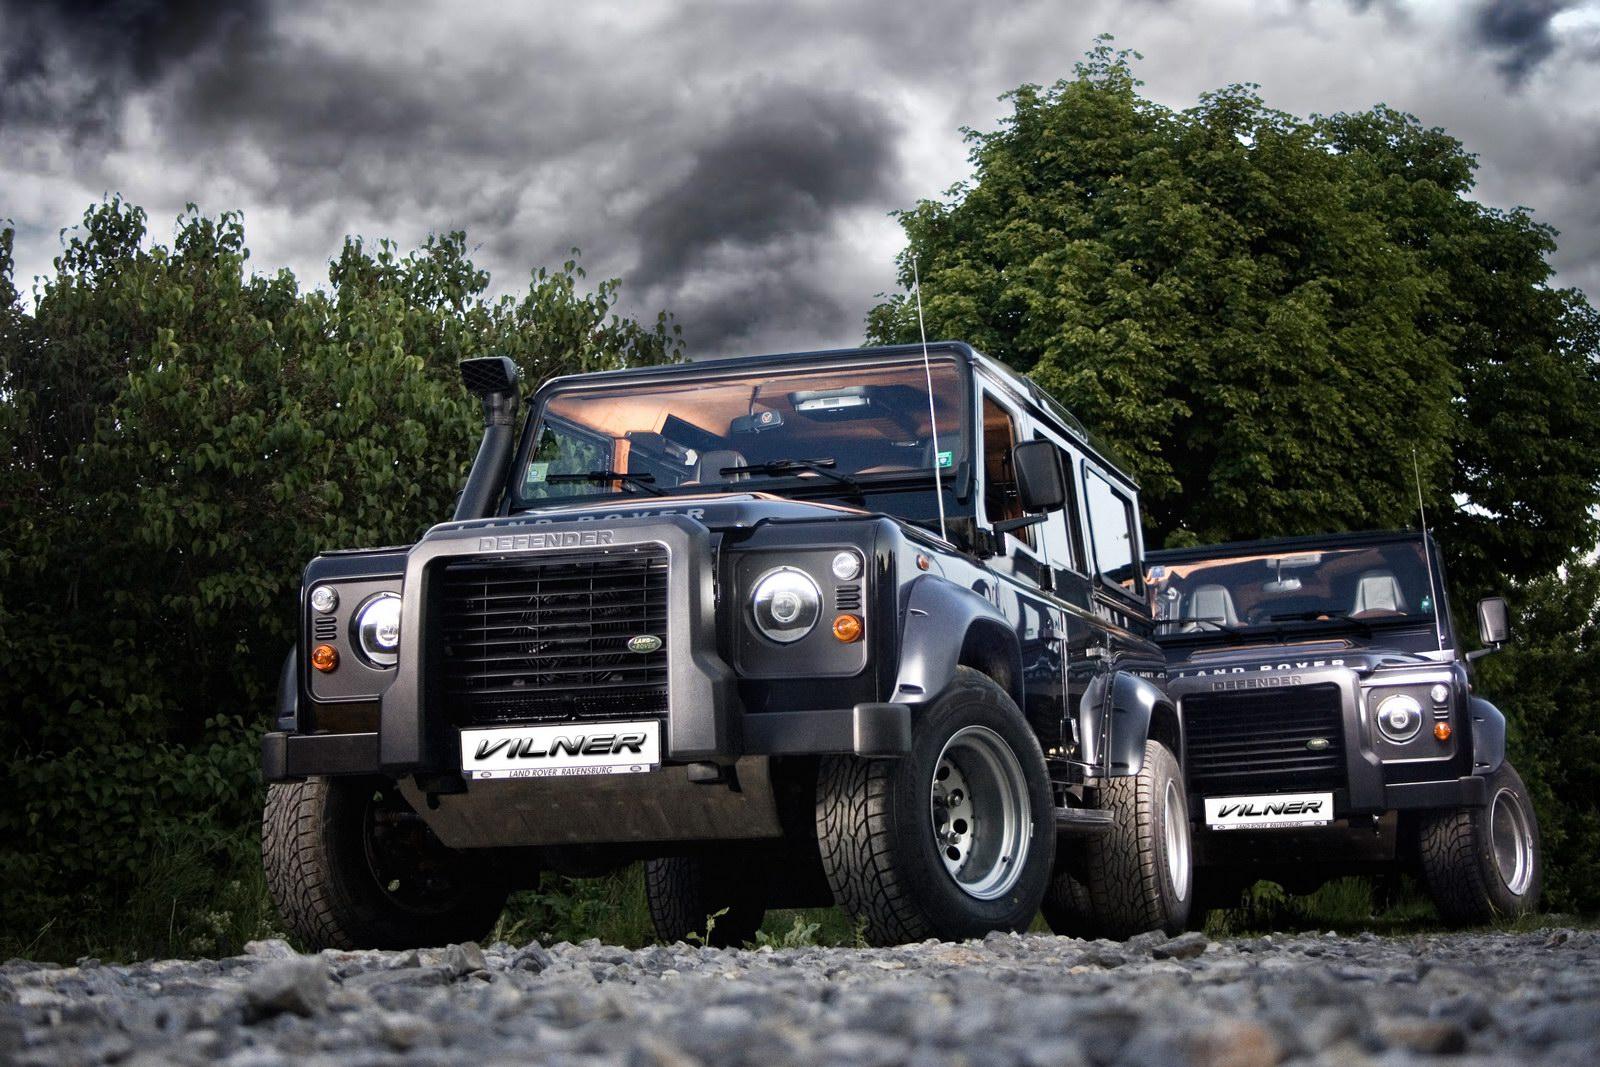 forbidden je zulu landrover news defender rover land motorworks custom supercharged prevnext hp fruit dashboard